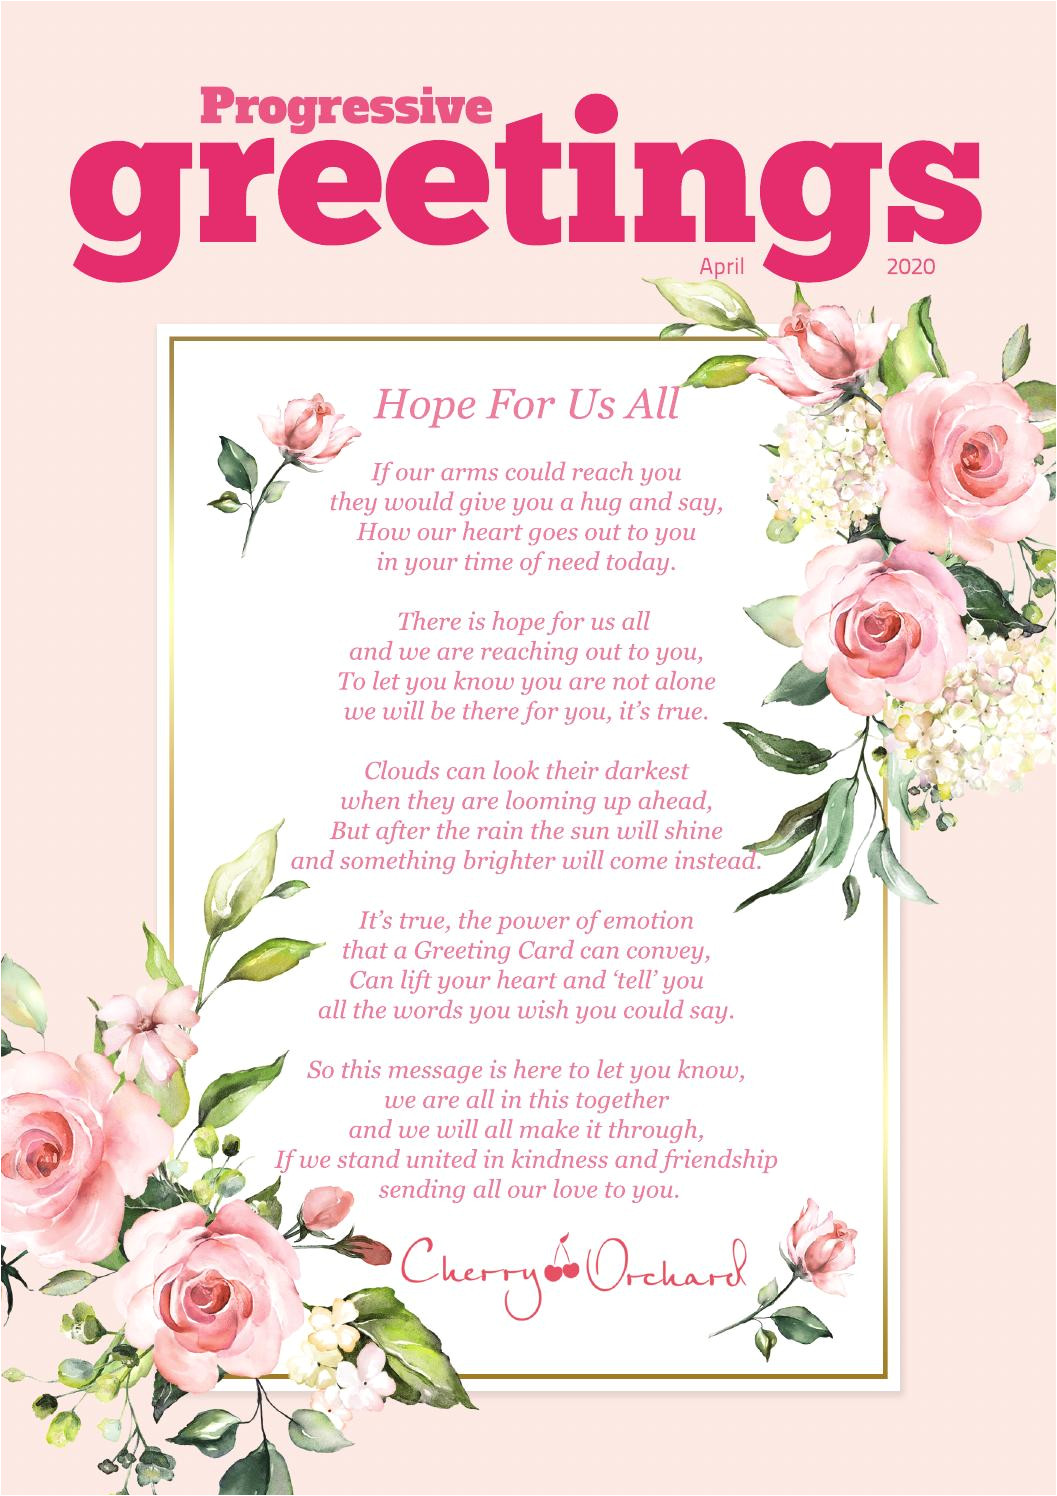 Anniversary Ke Liye Greeting Card Progressive Greetings April 2020 by Max Media Group issuu